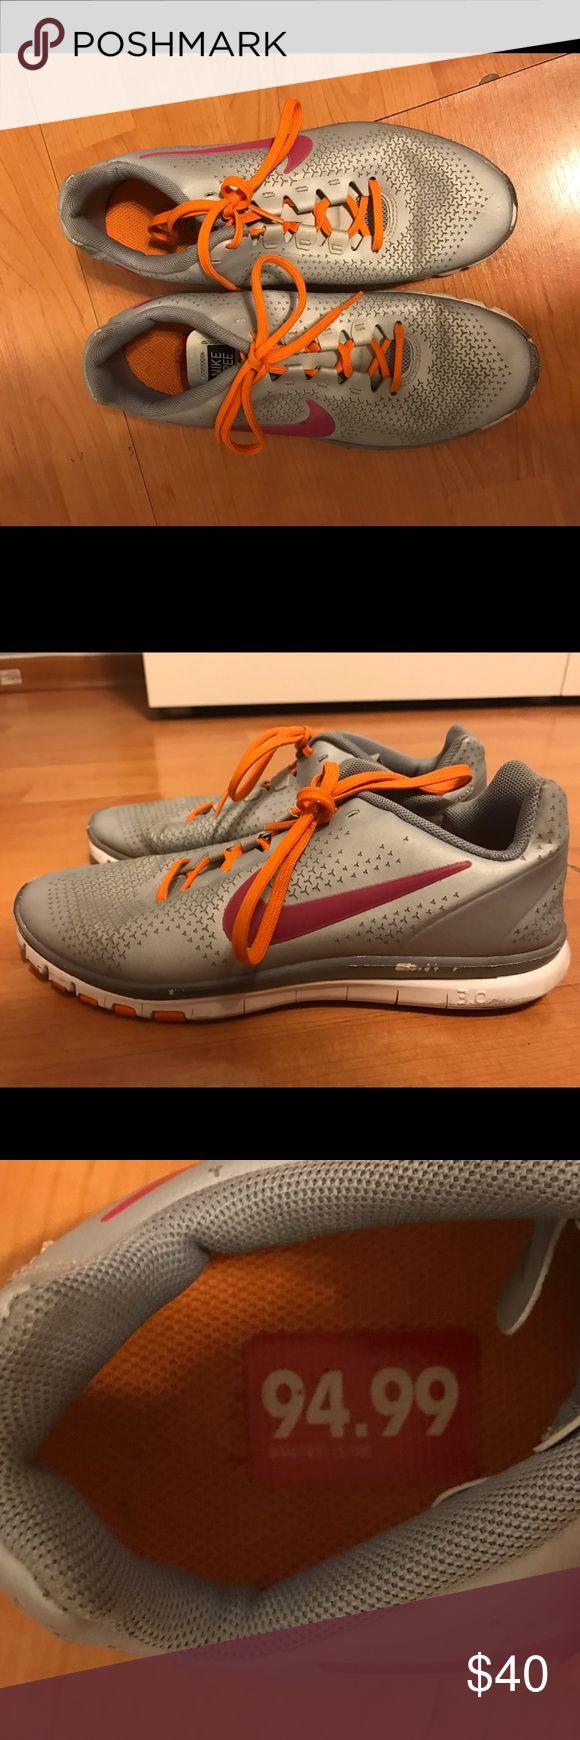 Nike Free runs 3.0 Used Nike Free Runs 3.0 color gray with fuschia check mark, orange laces. Women's 6.5 Nike Shoes Sneakers